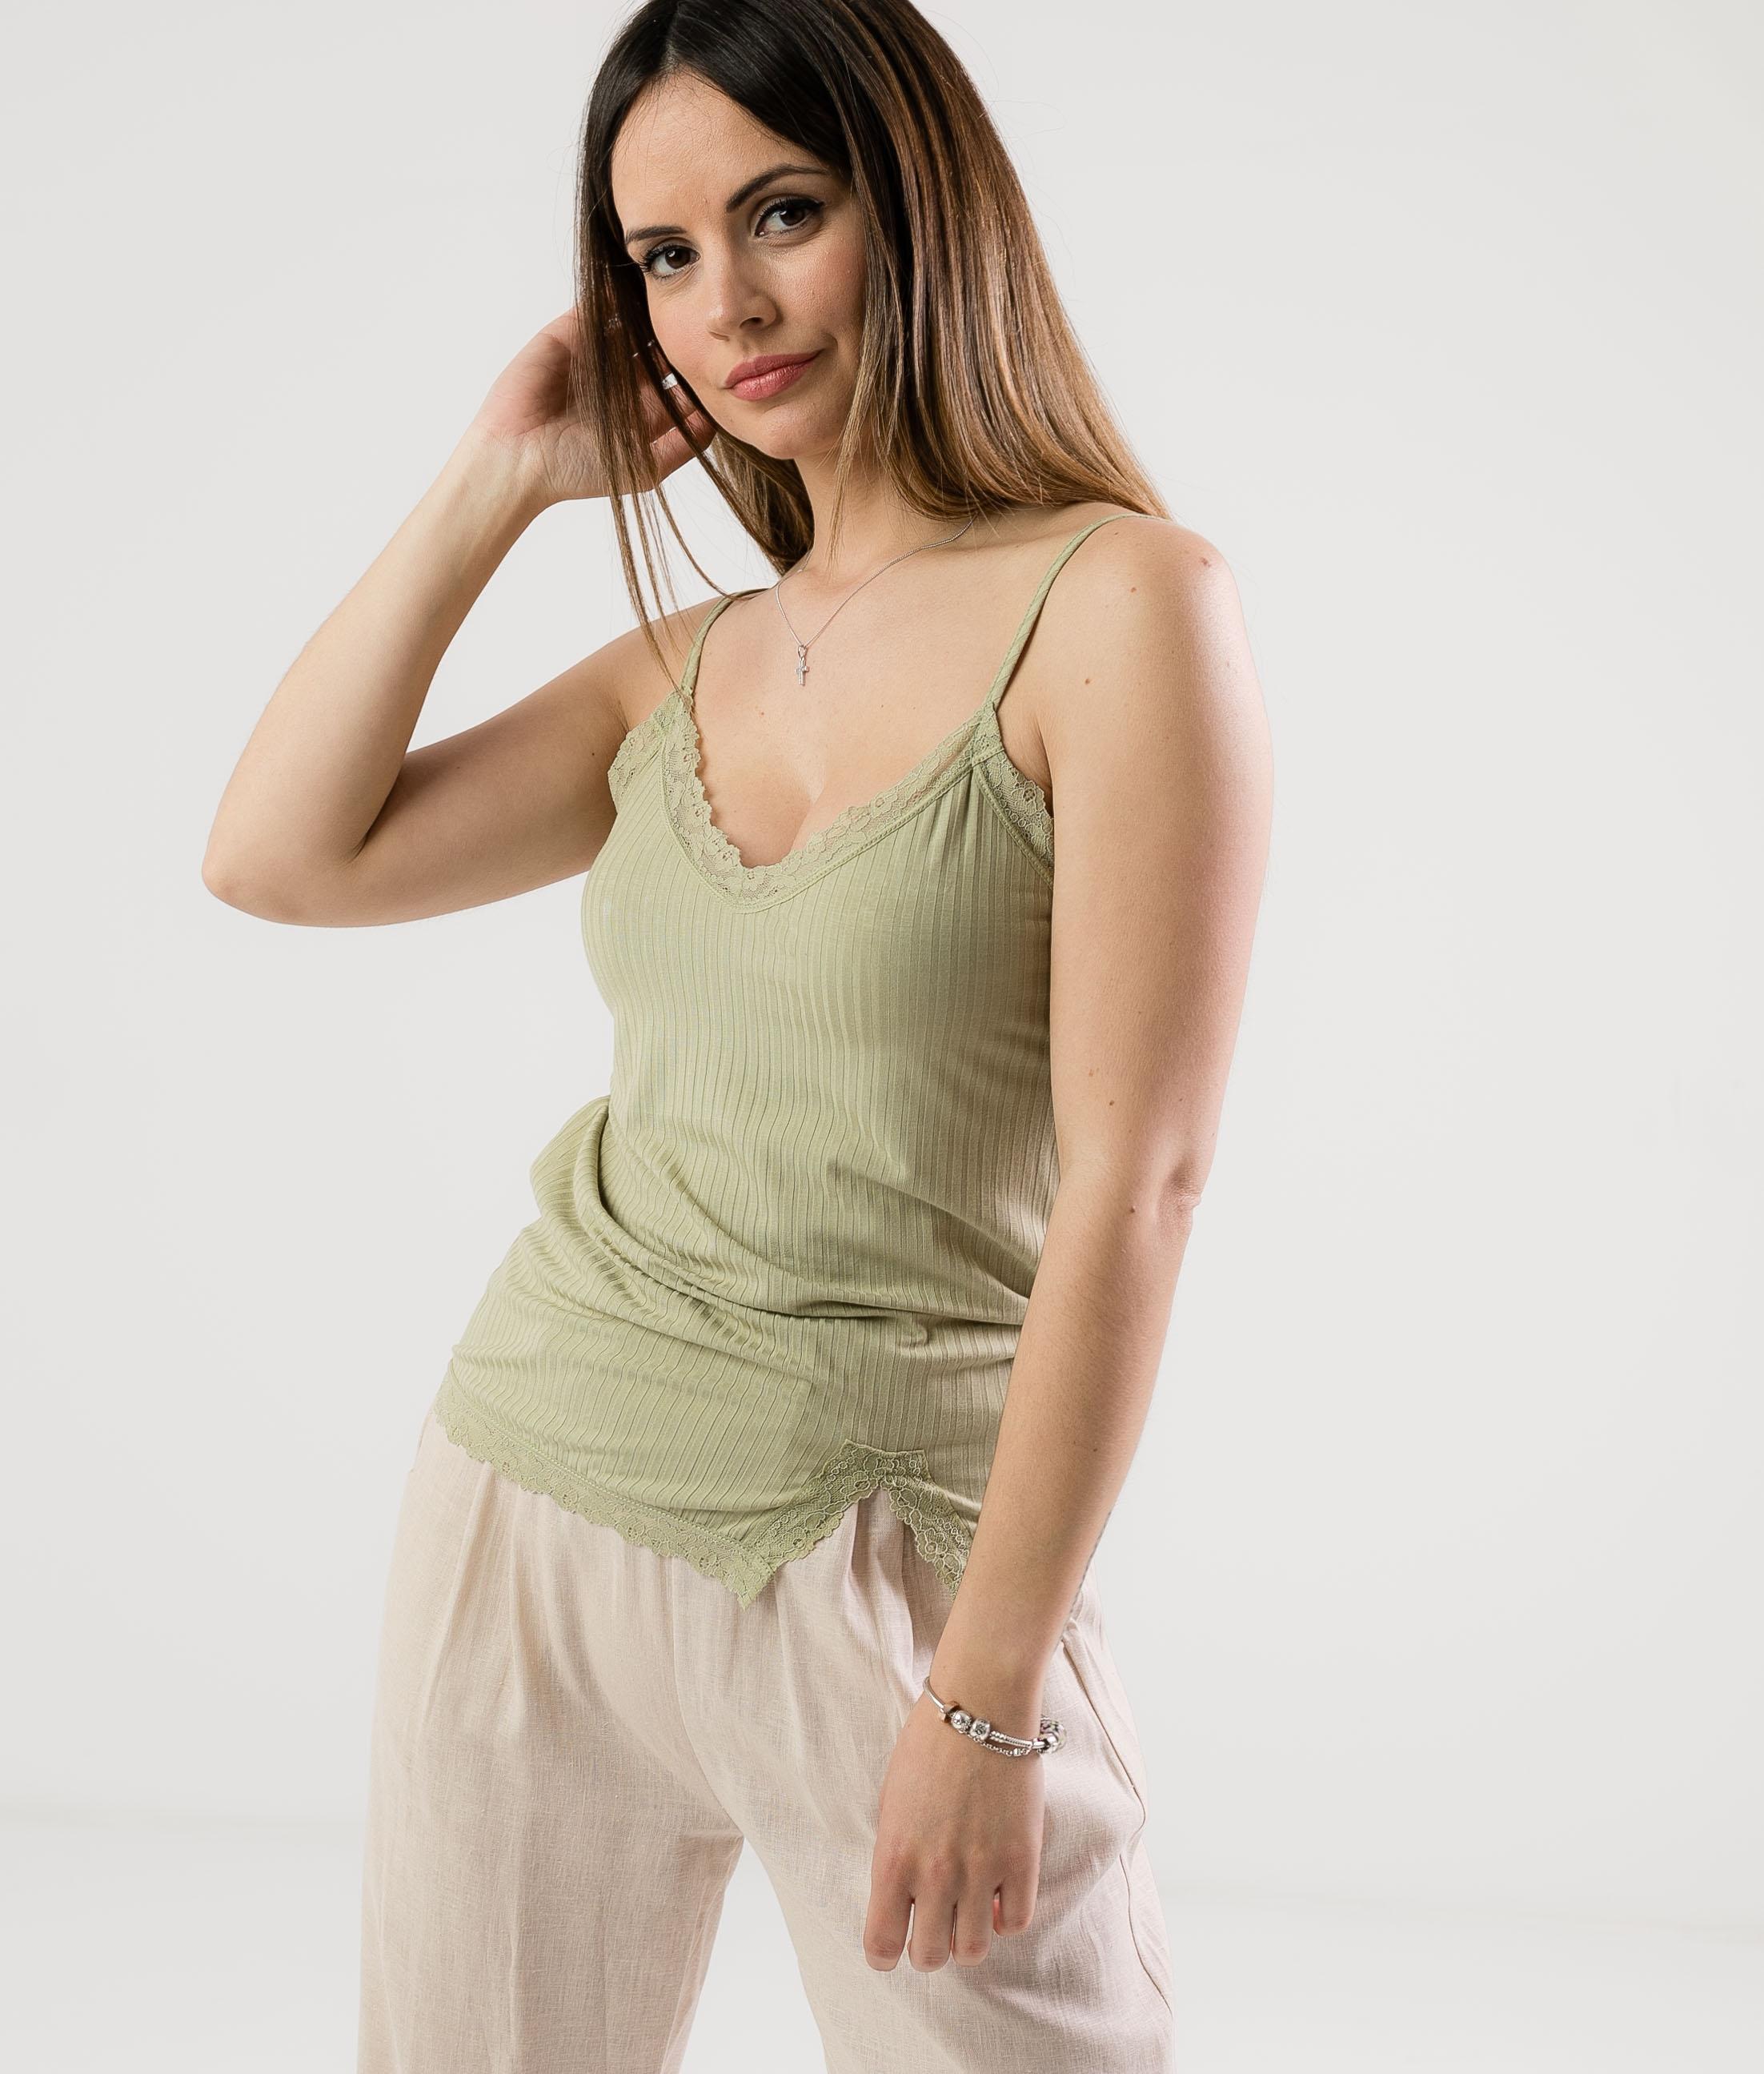 Camiseta Ranicha - Verde